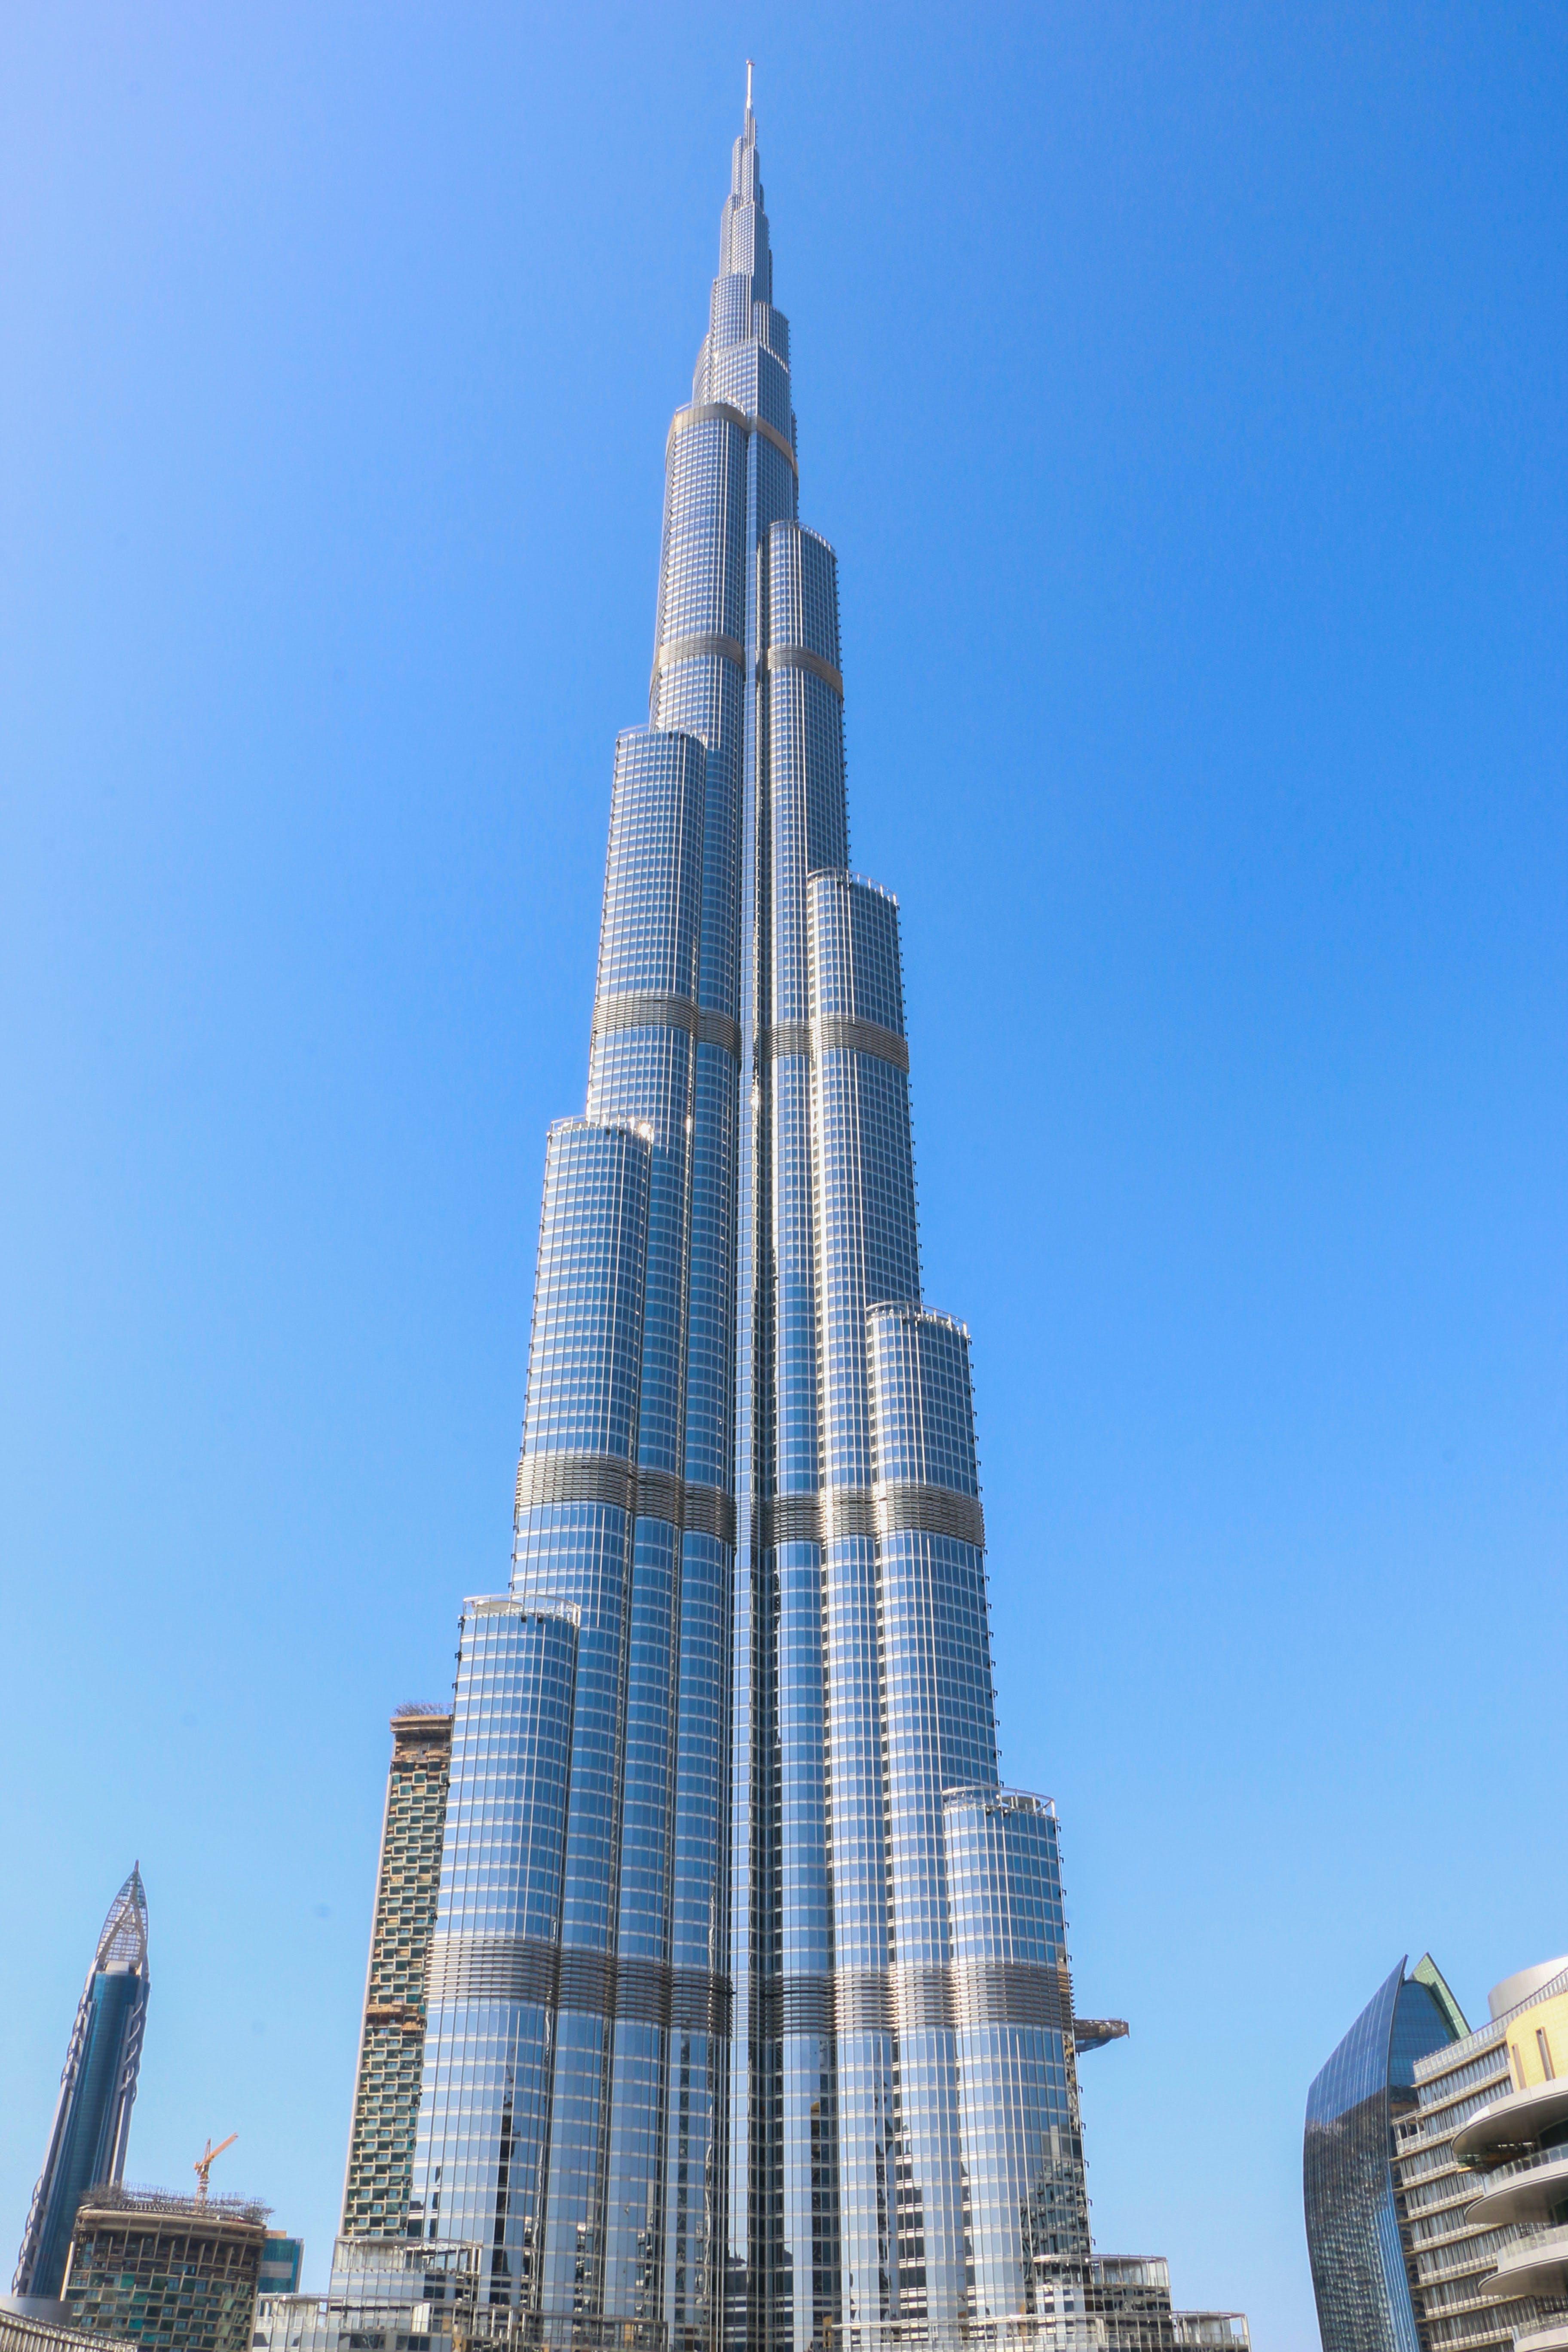 Free stock photo of architectural, architectural design, building, burj khalifa